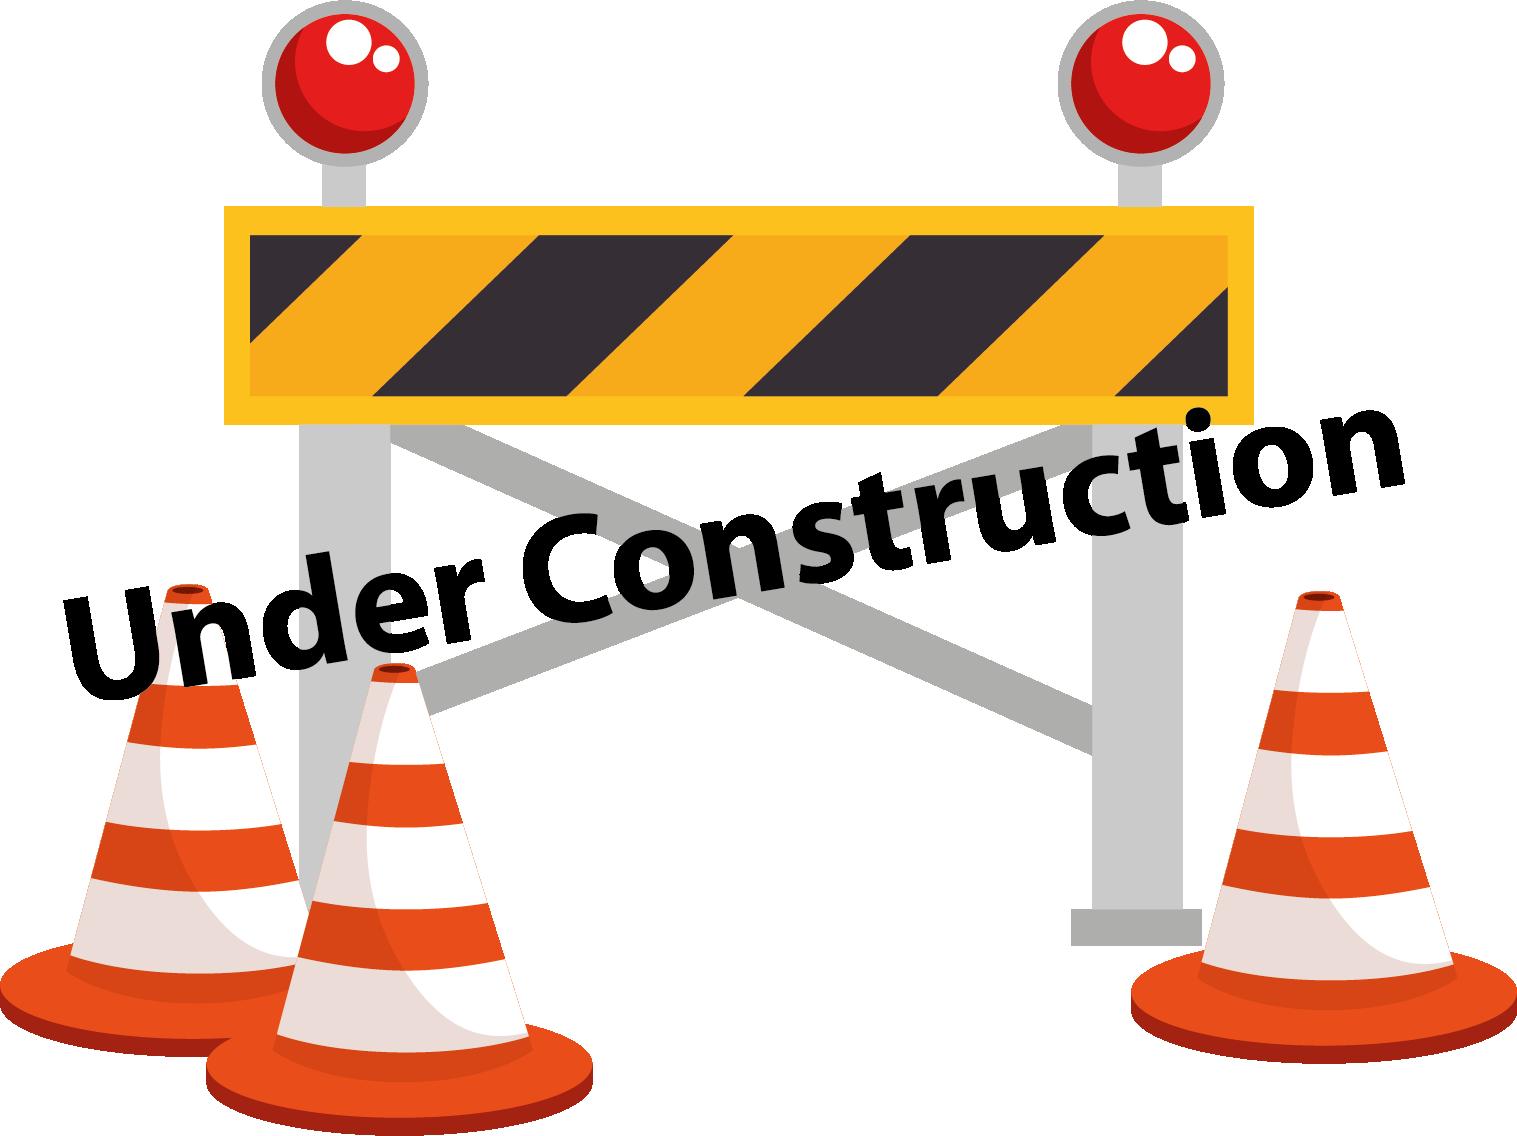 Adobestock 170735670 Under Construction 4